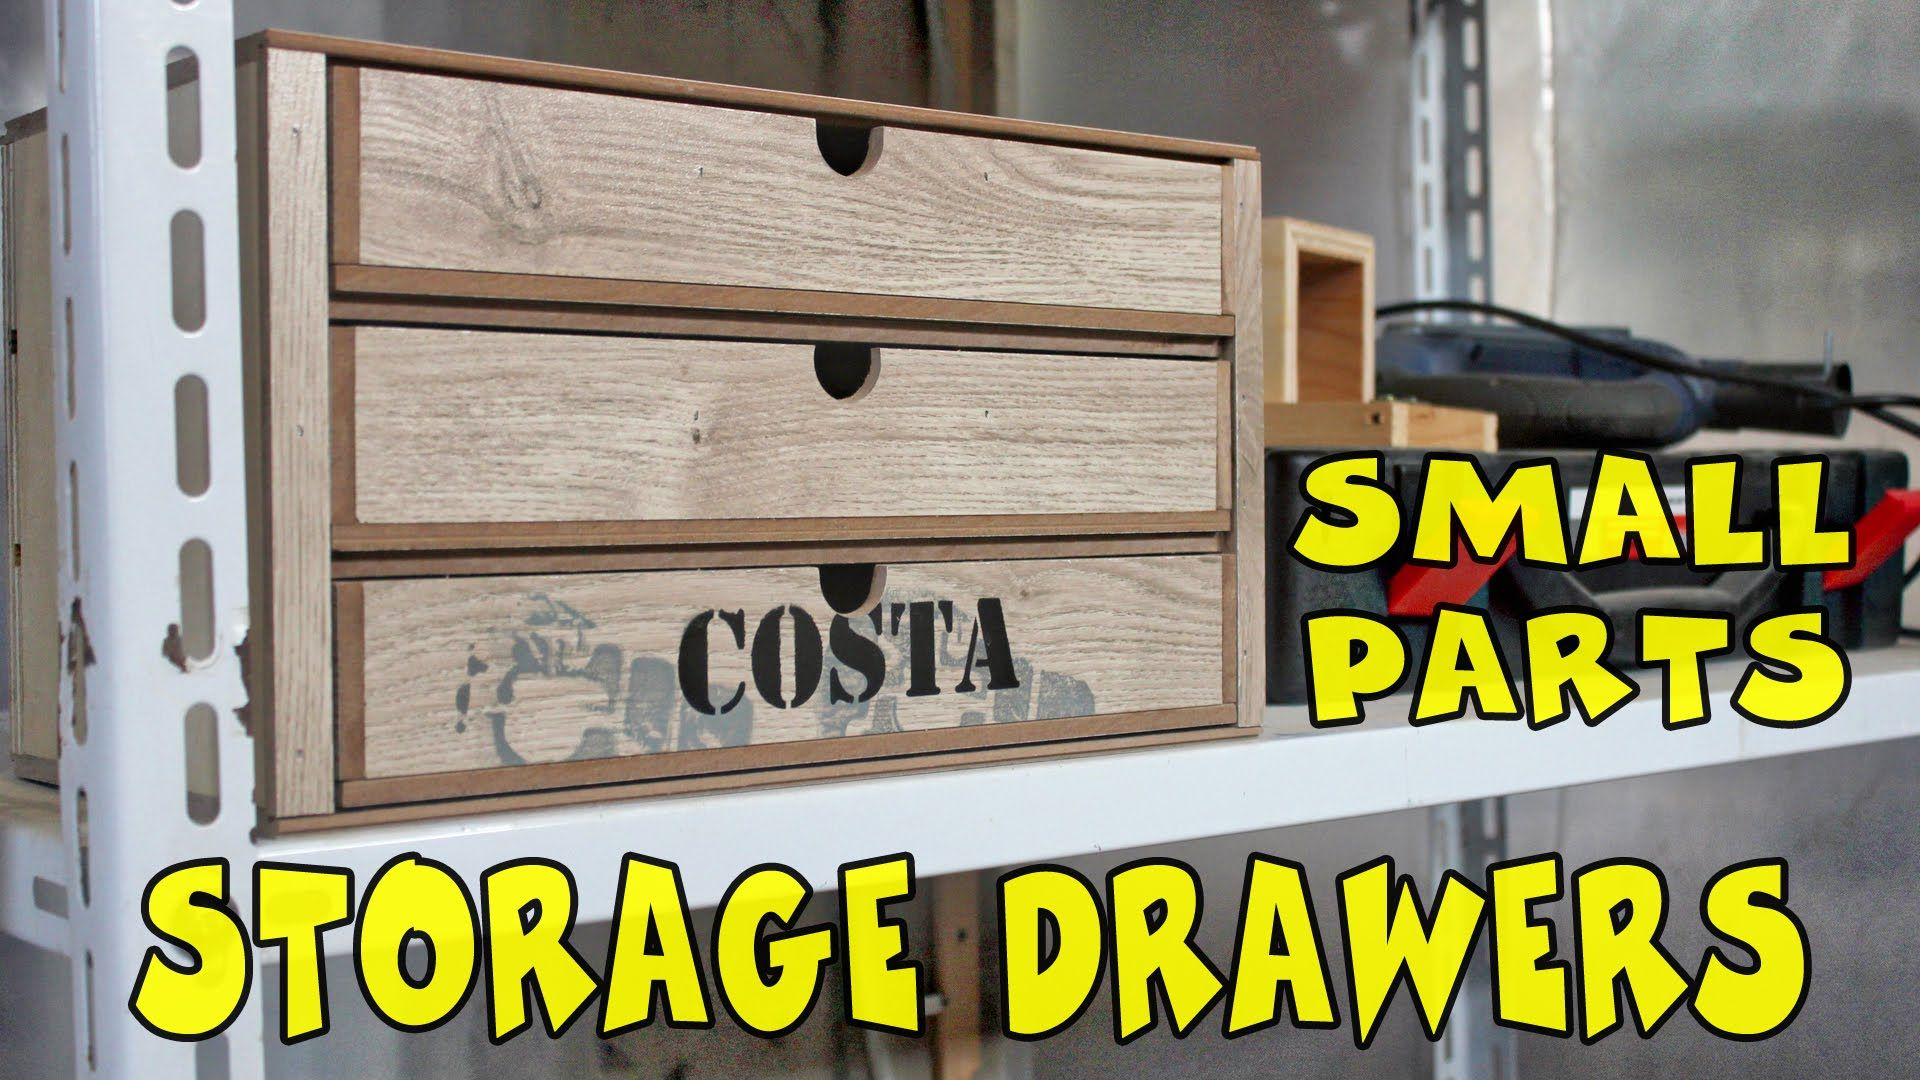 DIY Small parts storage drawers made of scrap laminate flooring and